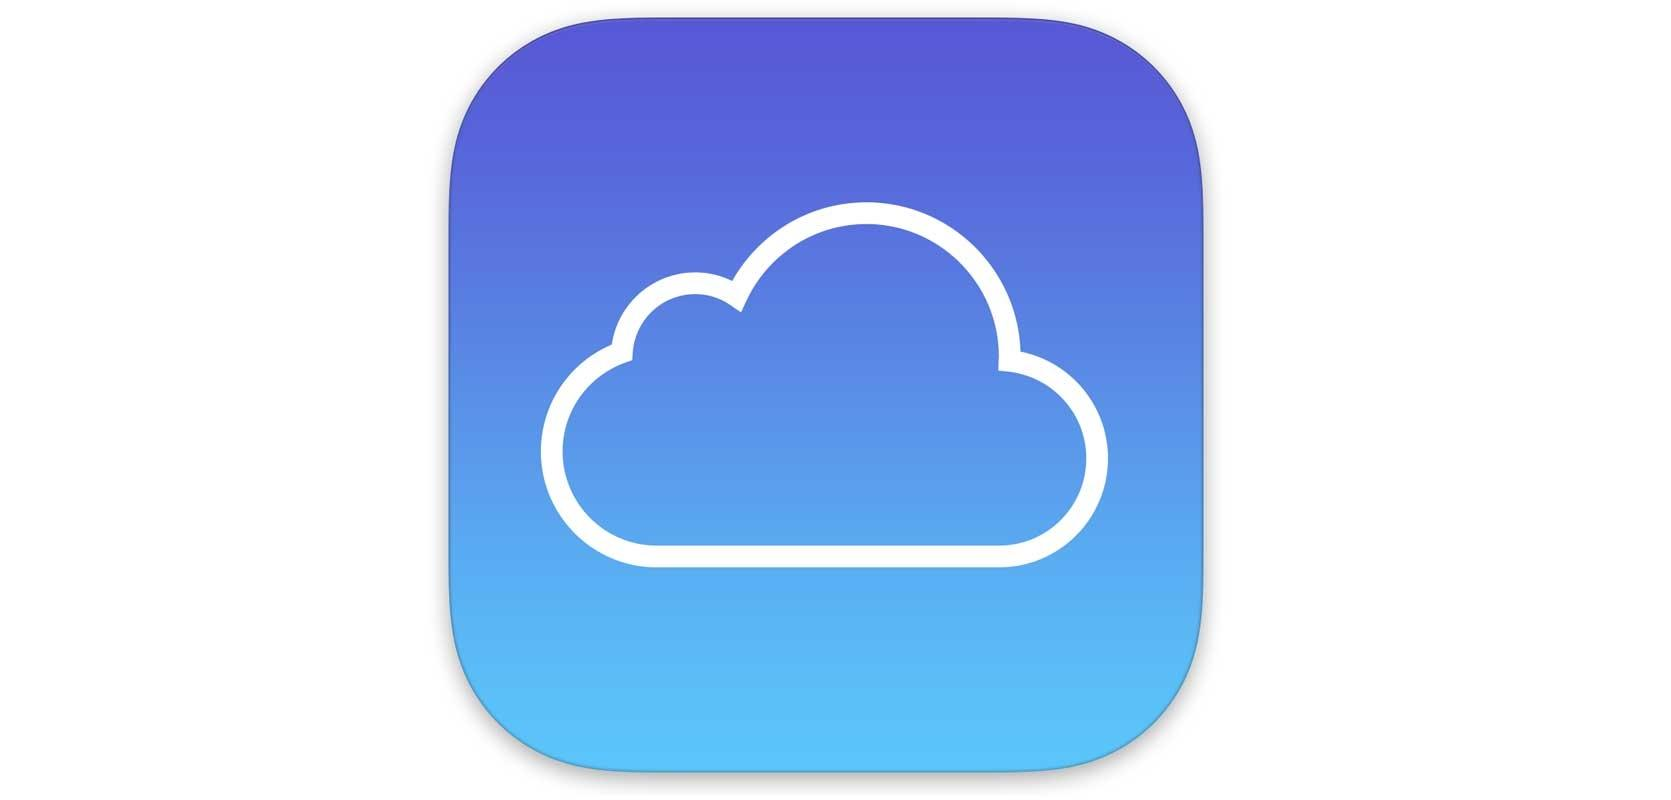 Как вернуть оригинал фото на iPhone из iCloud?